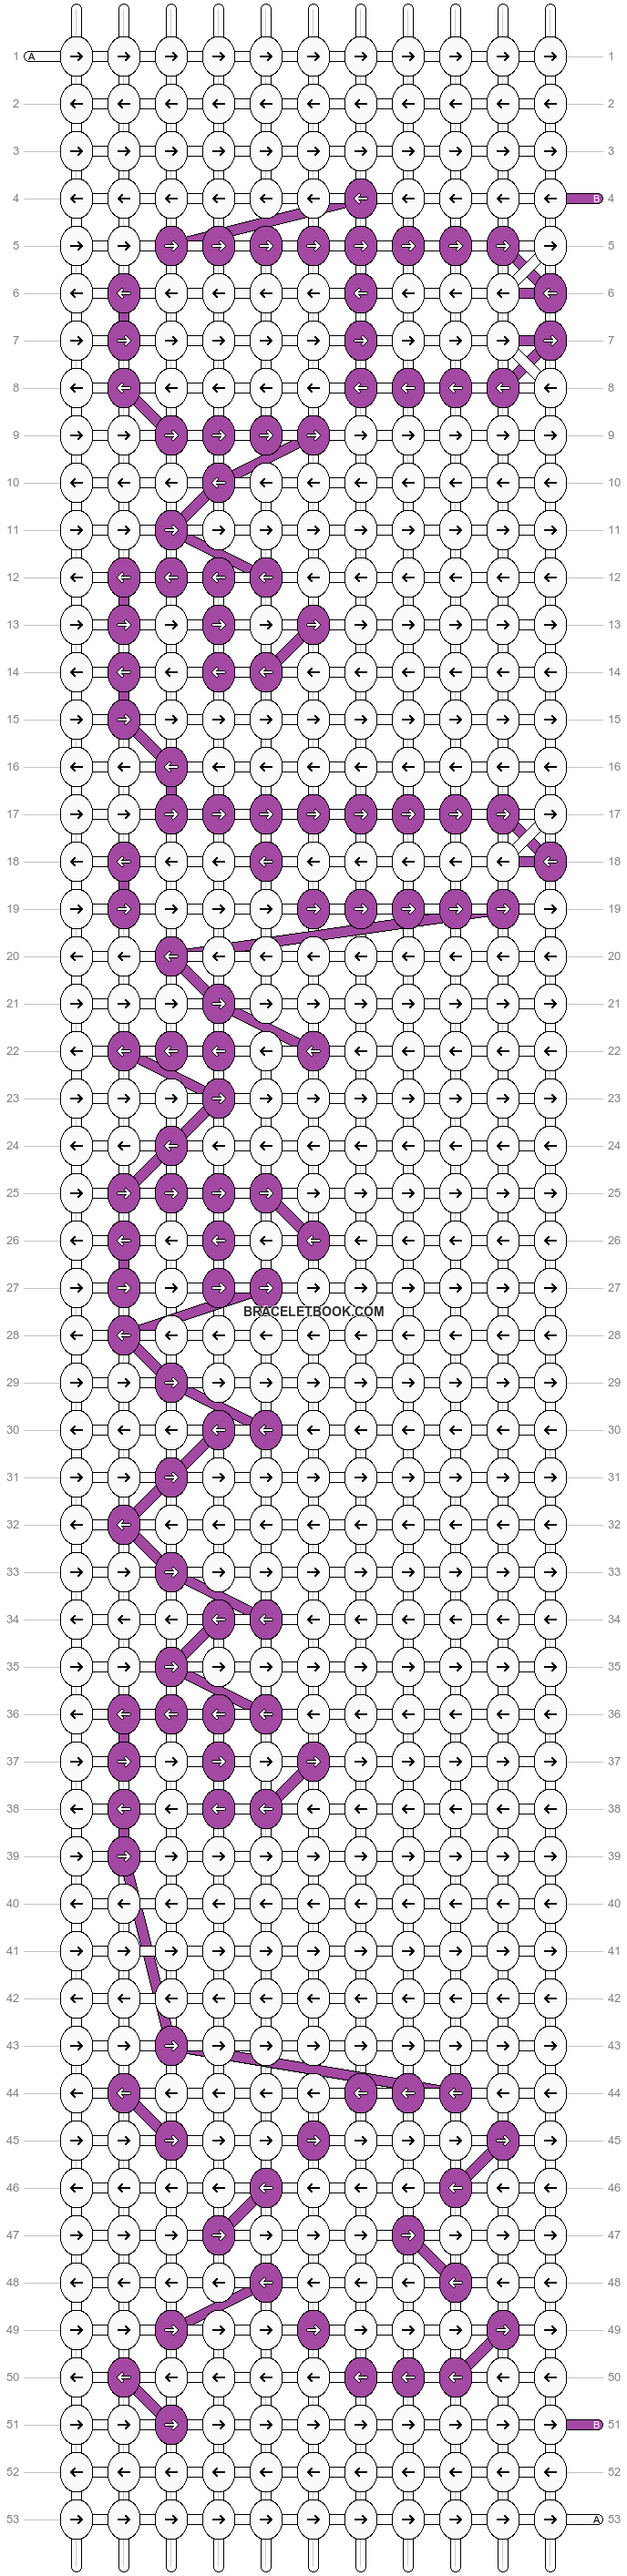 Alpha pattern #1798 pattern